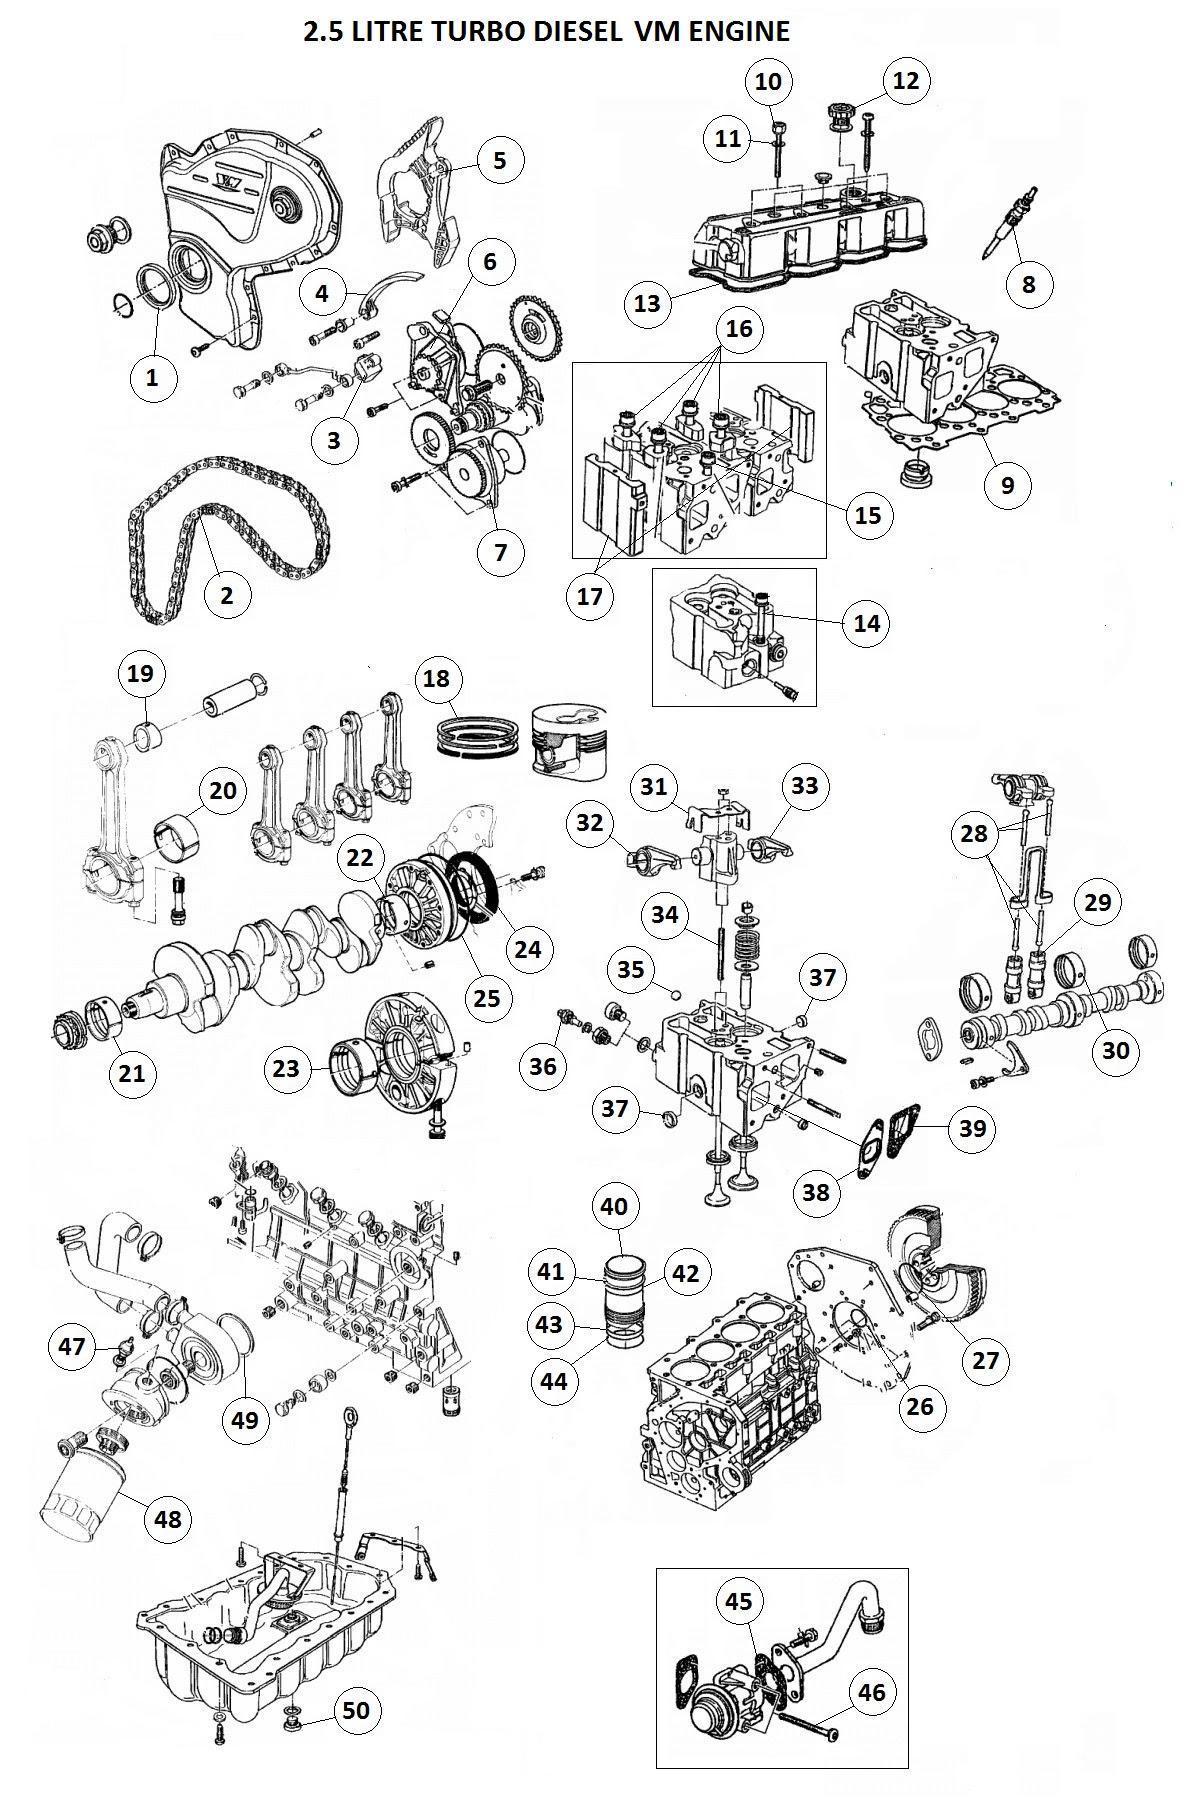 96 jeep cherokee 5 2 engine diagram